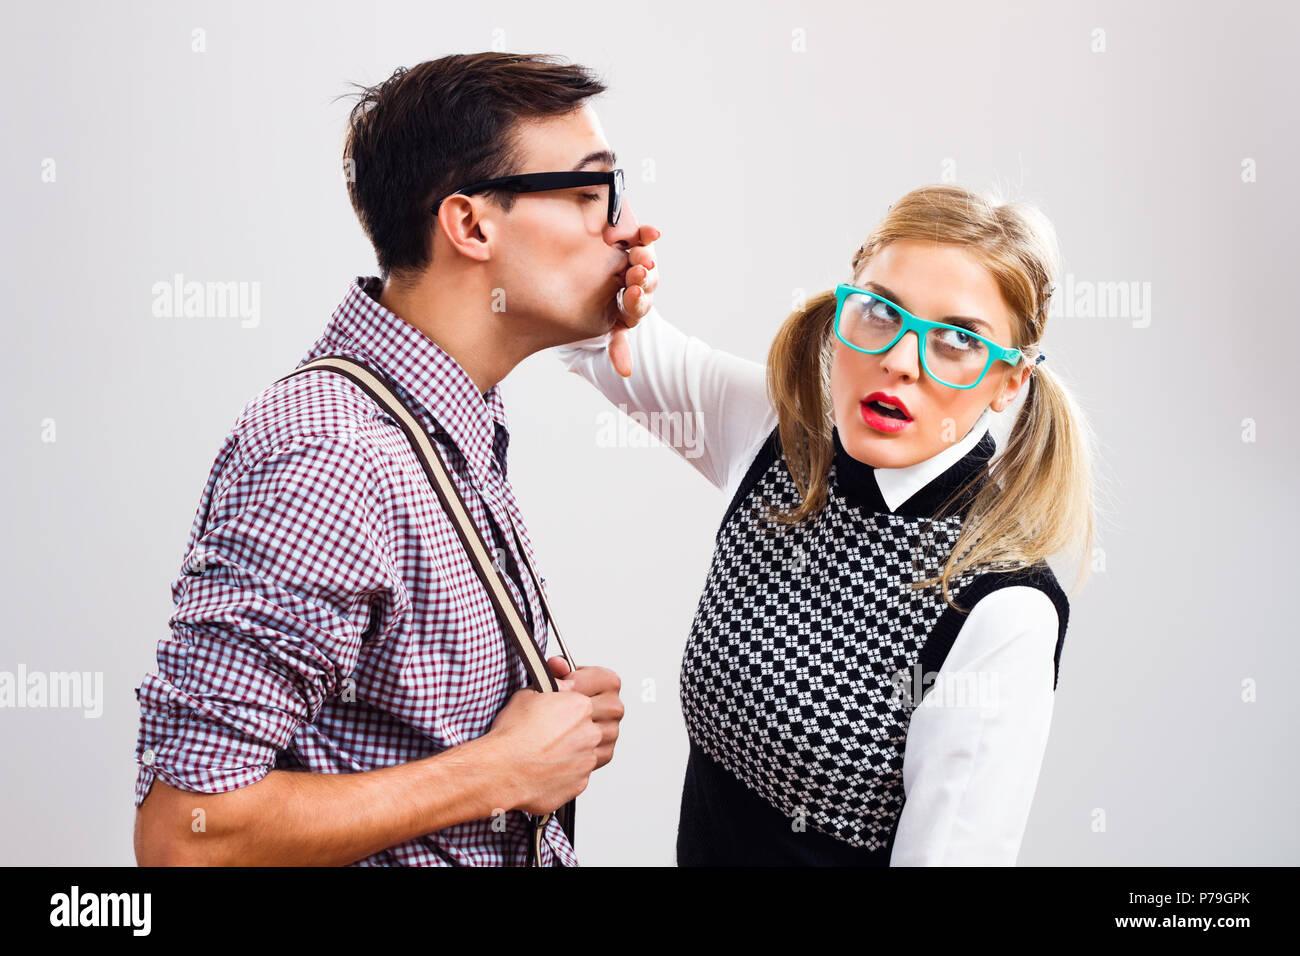 Nerdy woman doesn't like this nerdy man. - Stock Image